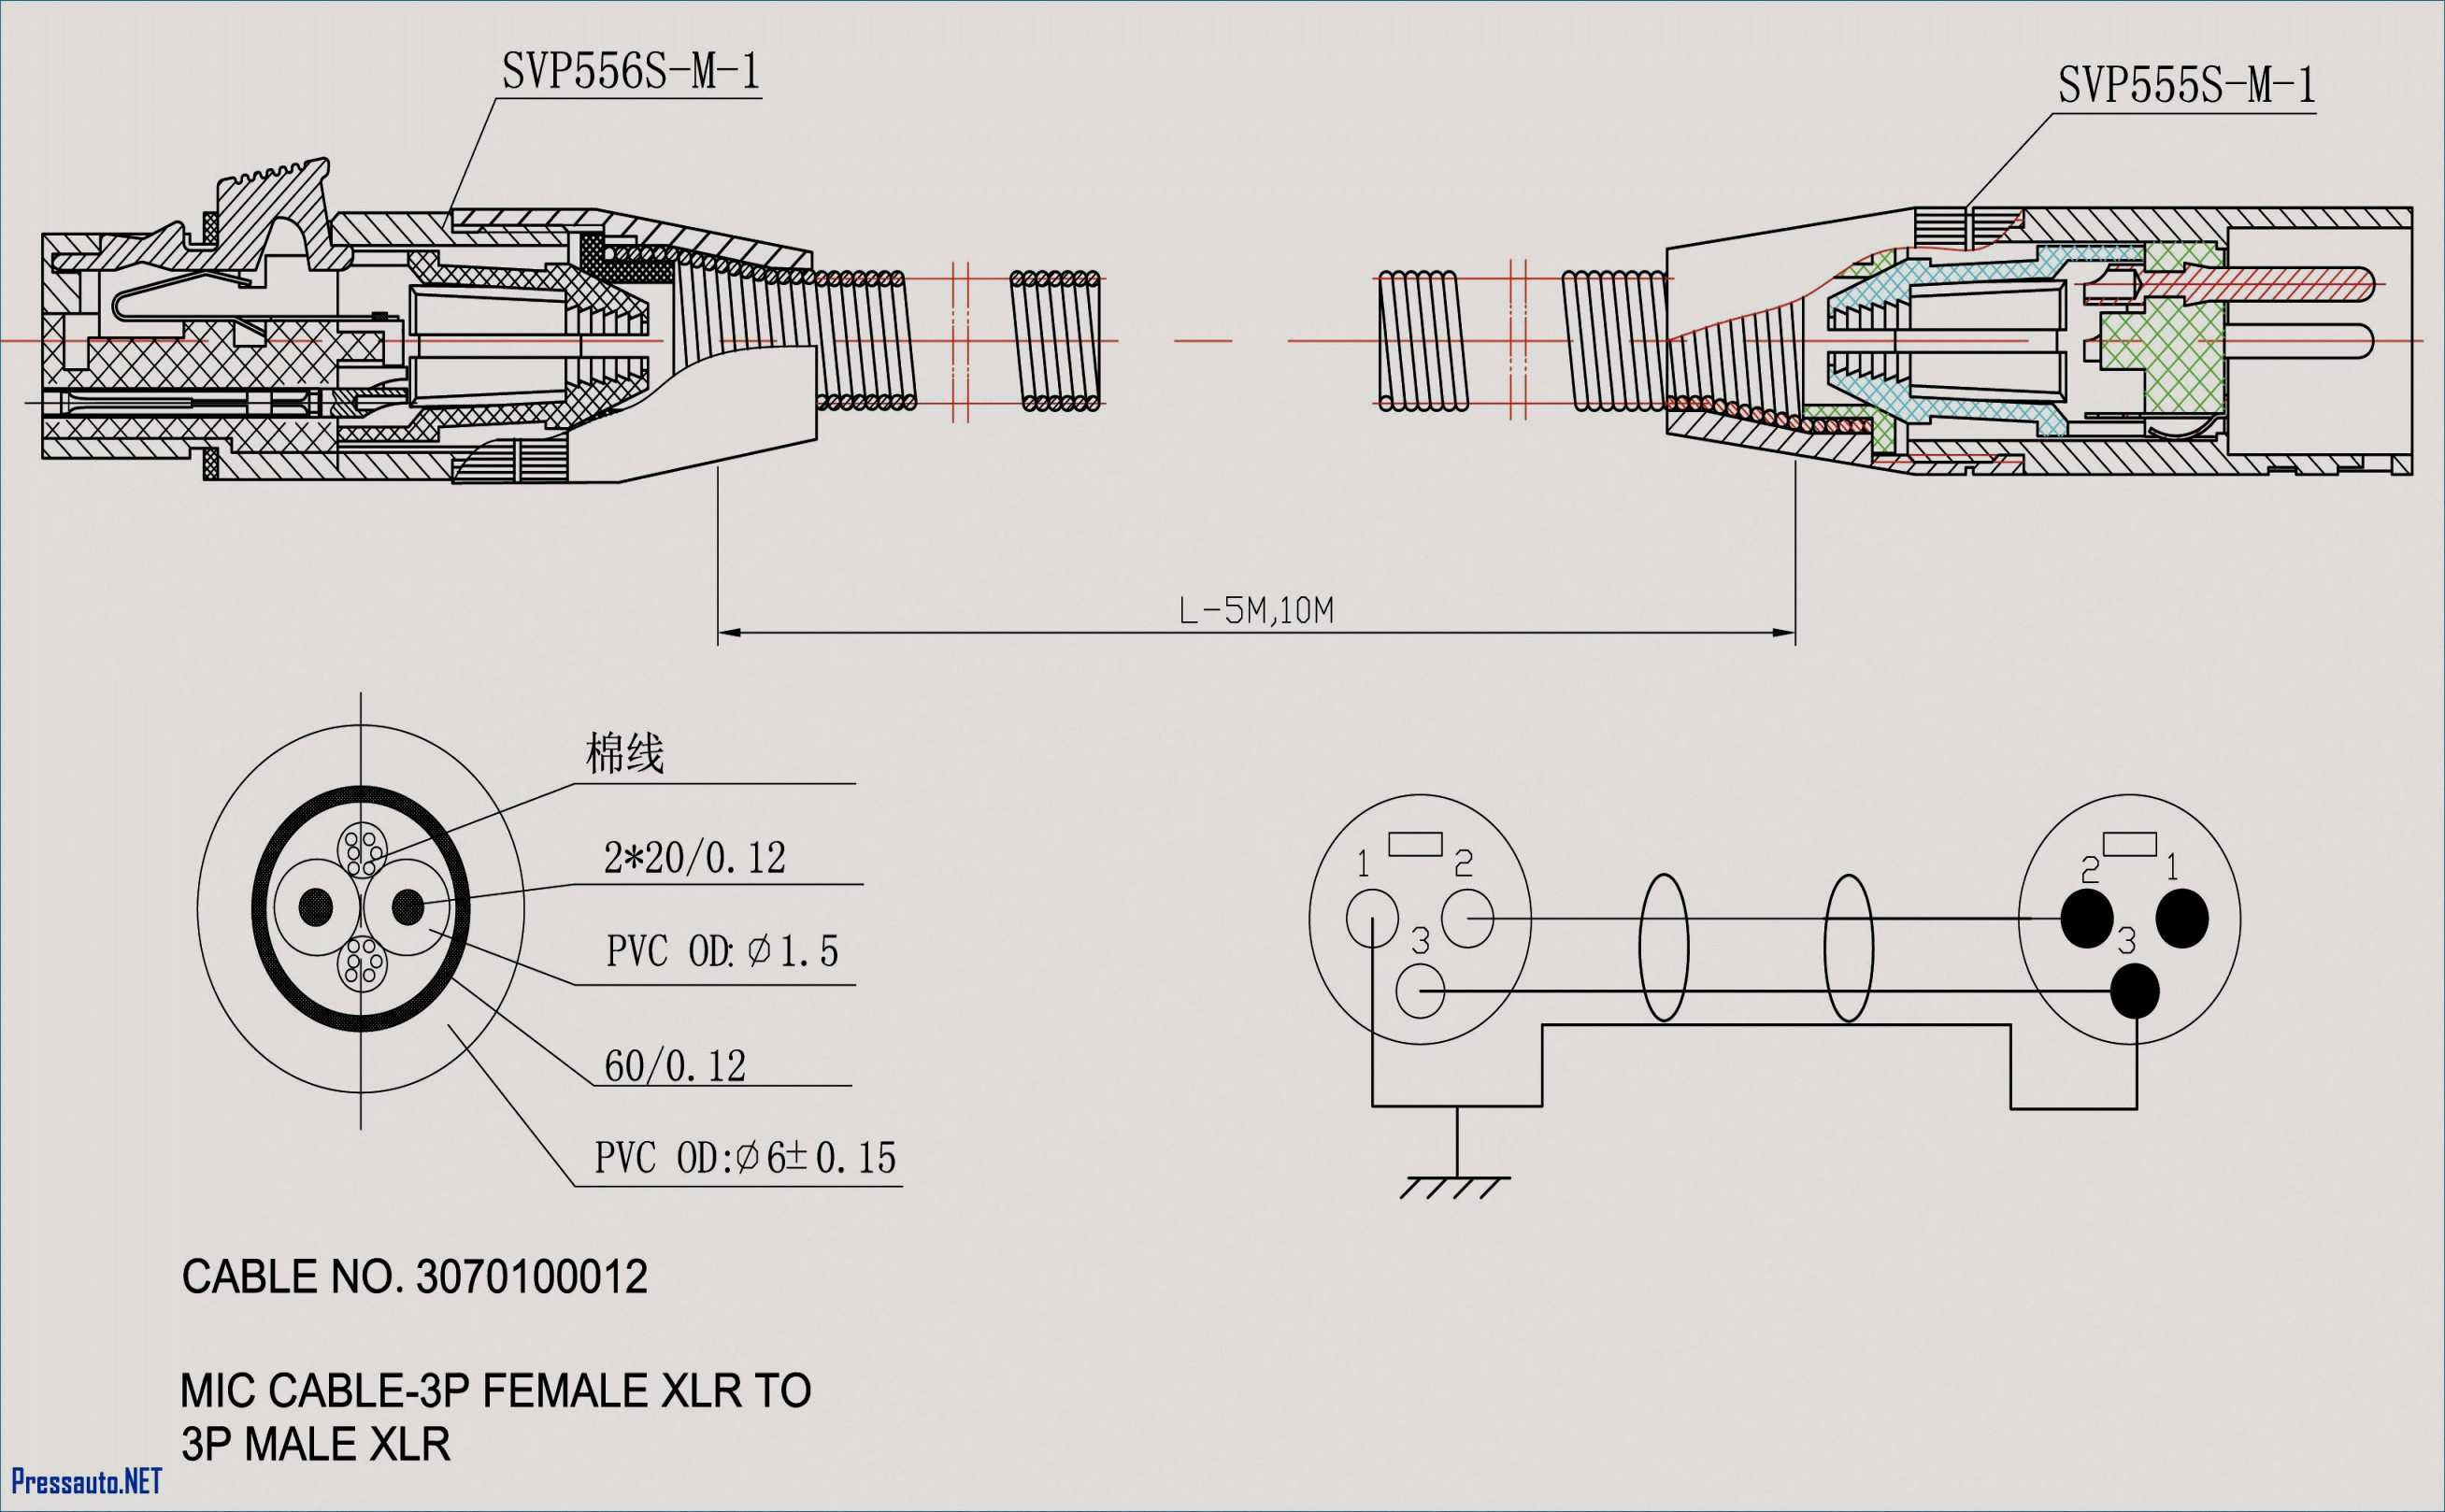 3 Phase To Single Phase Transformer Diagram Jeido Org Roto Phase Wiring Diagram